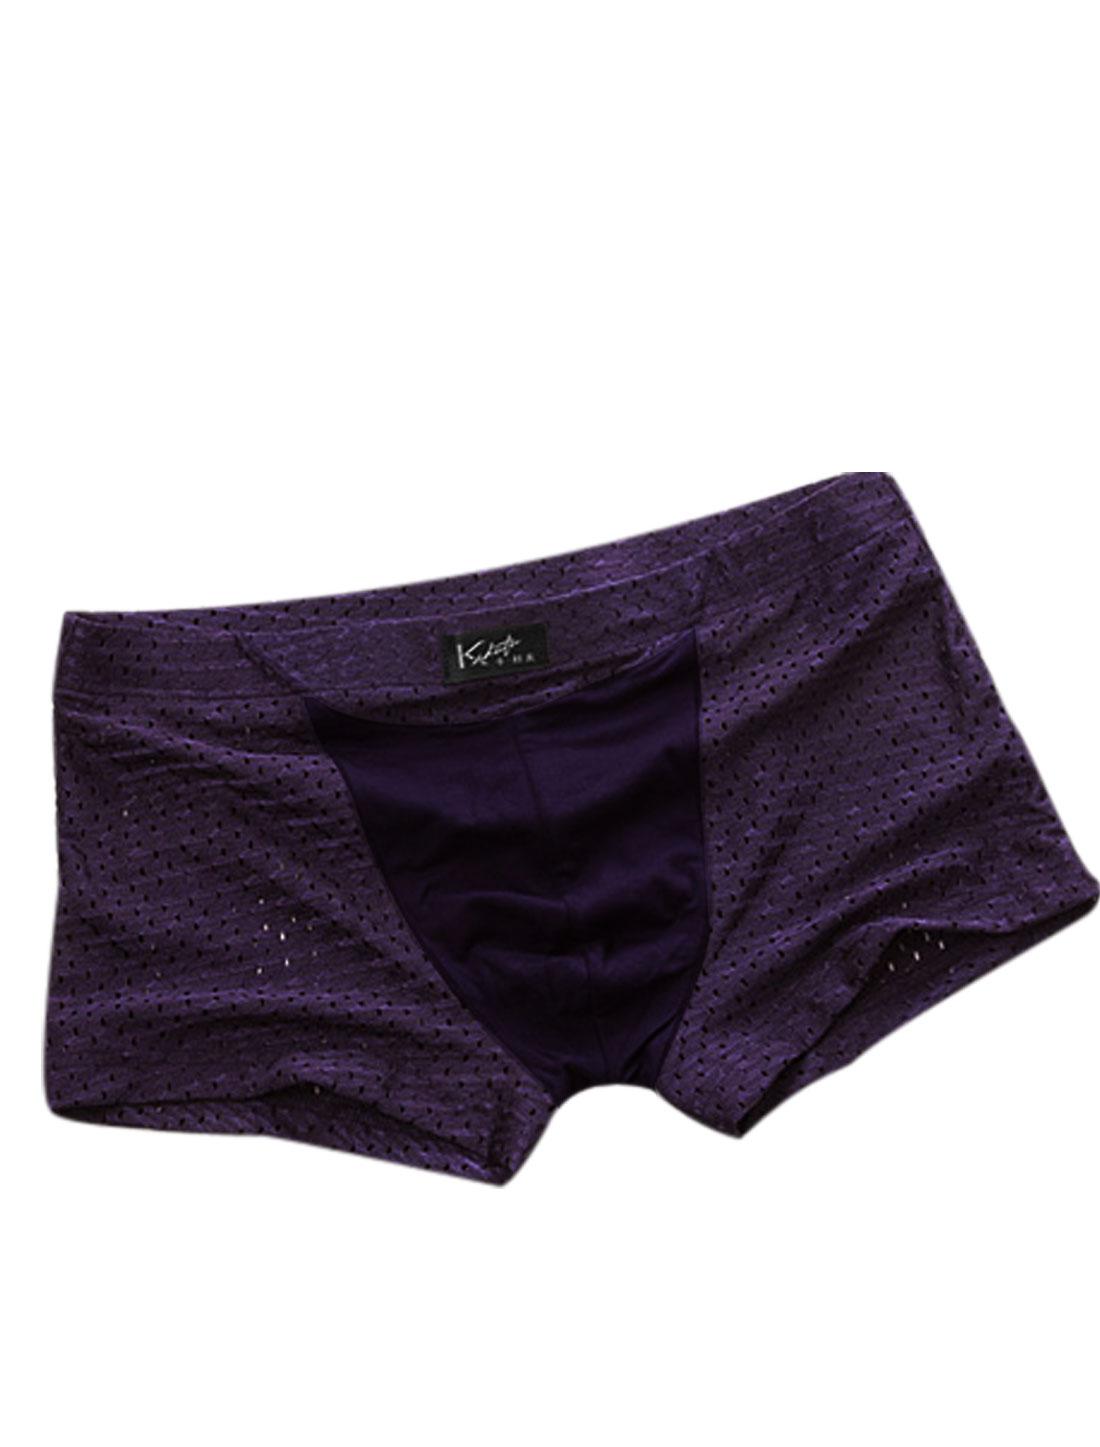 Men Fashion Style Hollow Out Design Boxer Brief Dark Purple W30